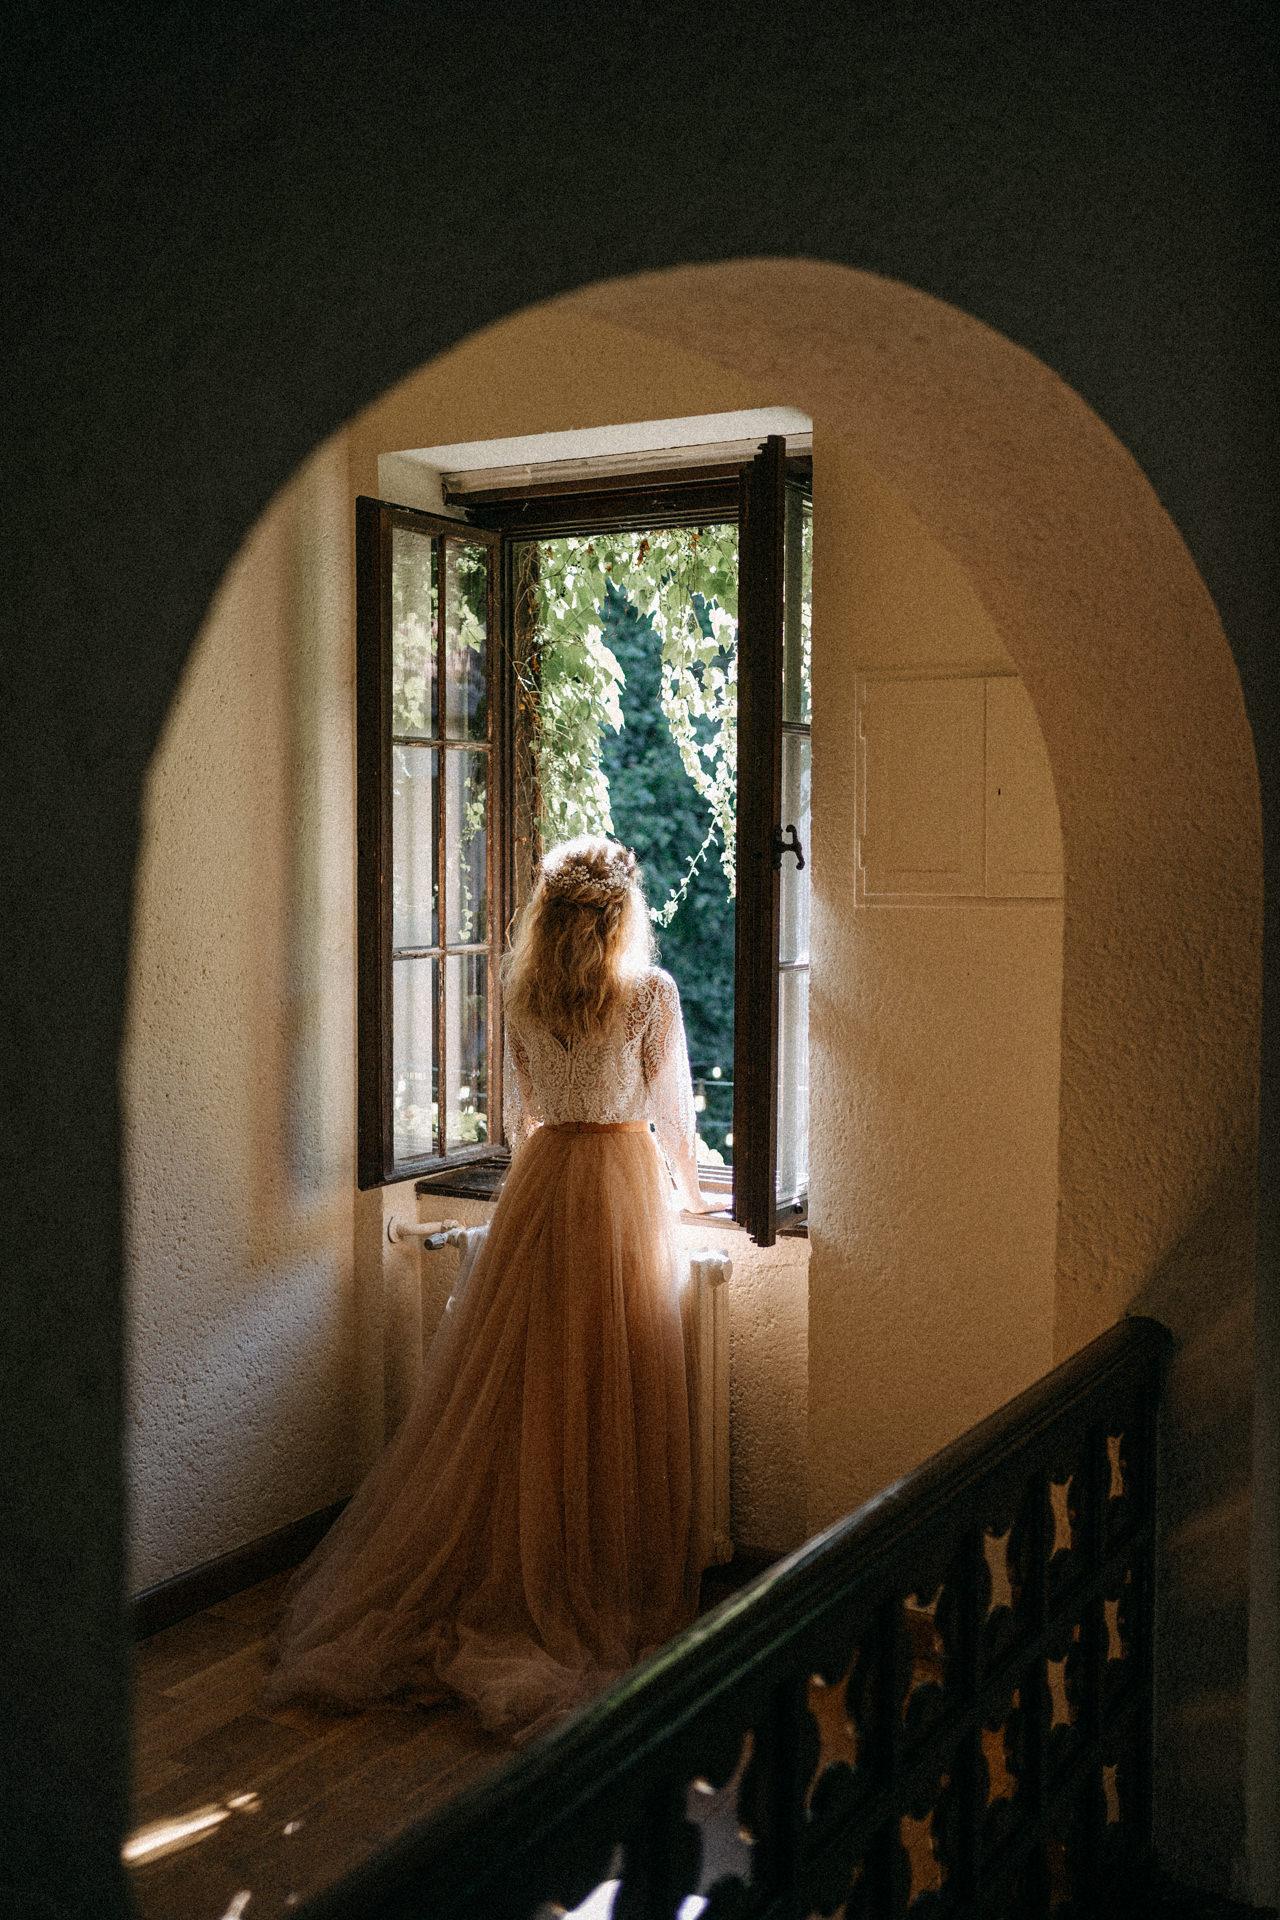 sorg villa eskuvo menyasszony